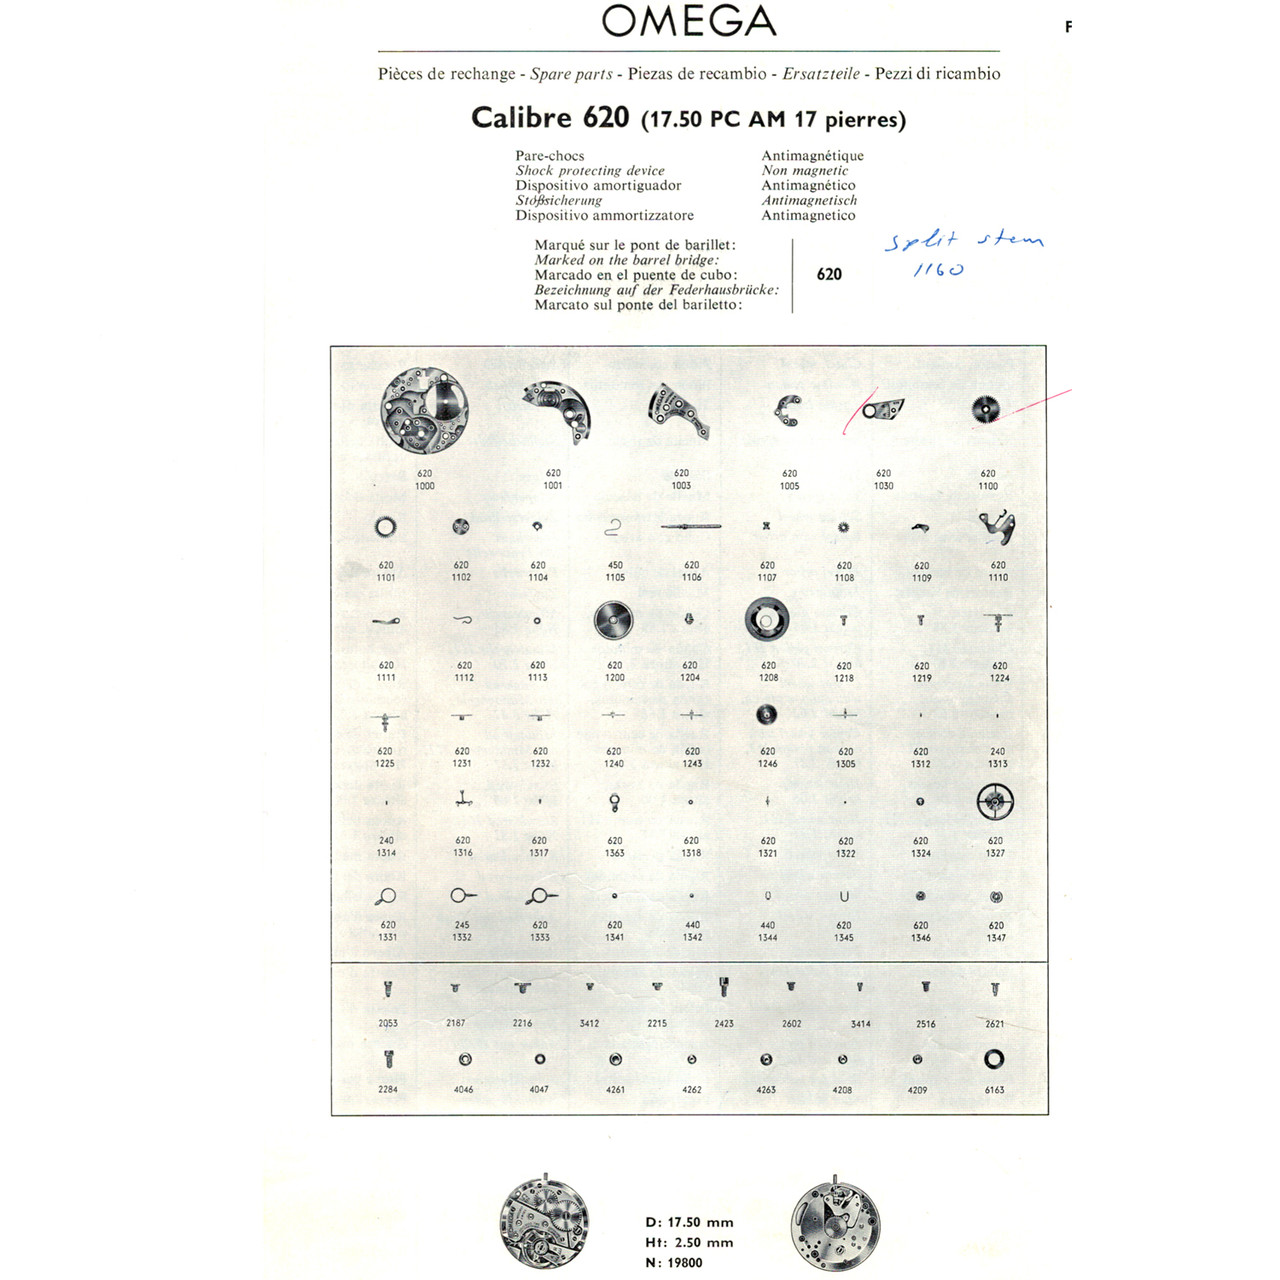 Original Omega Clutch Wheel Caliber 620